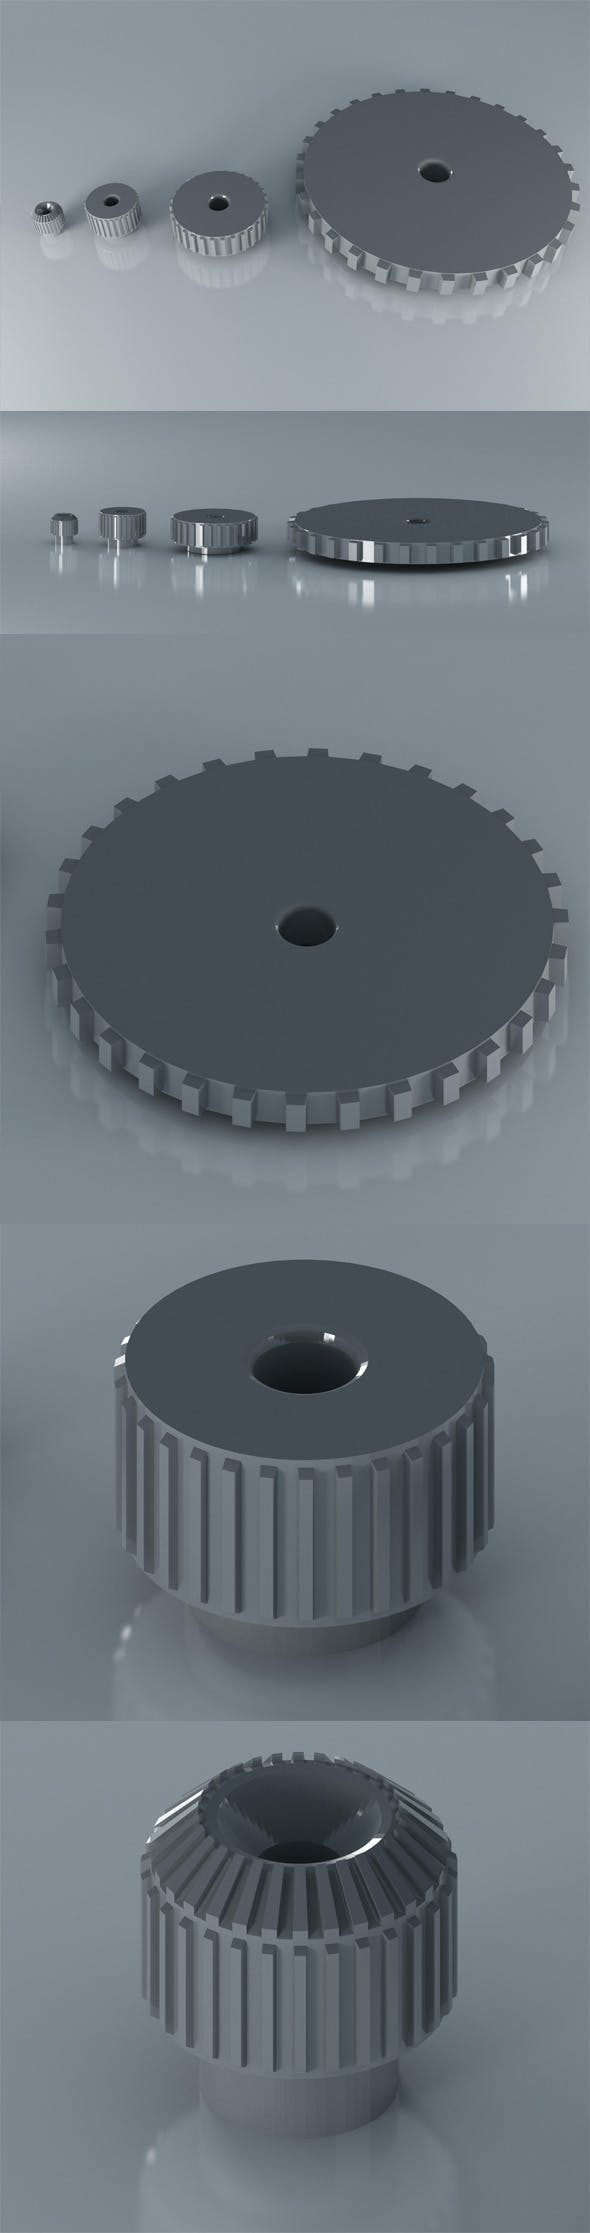 Gears - 3DOcean Item for Sale